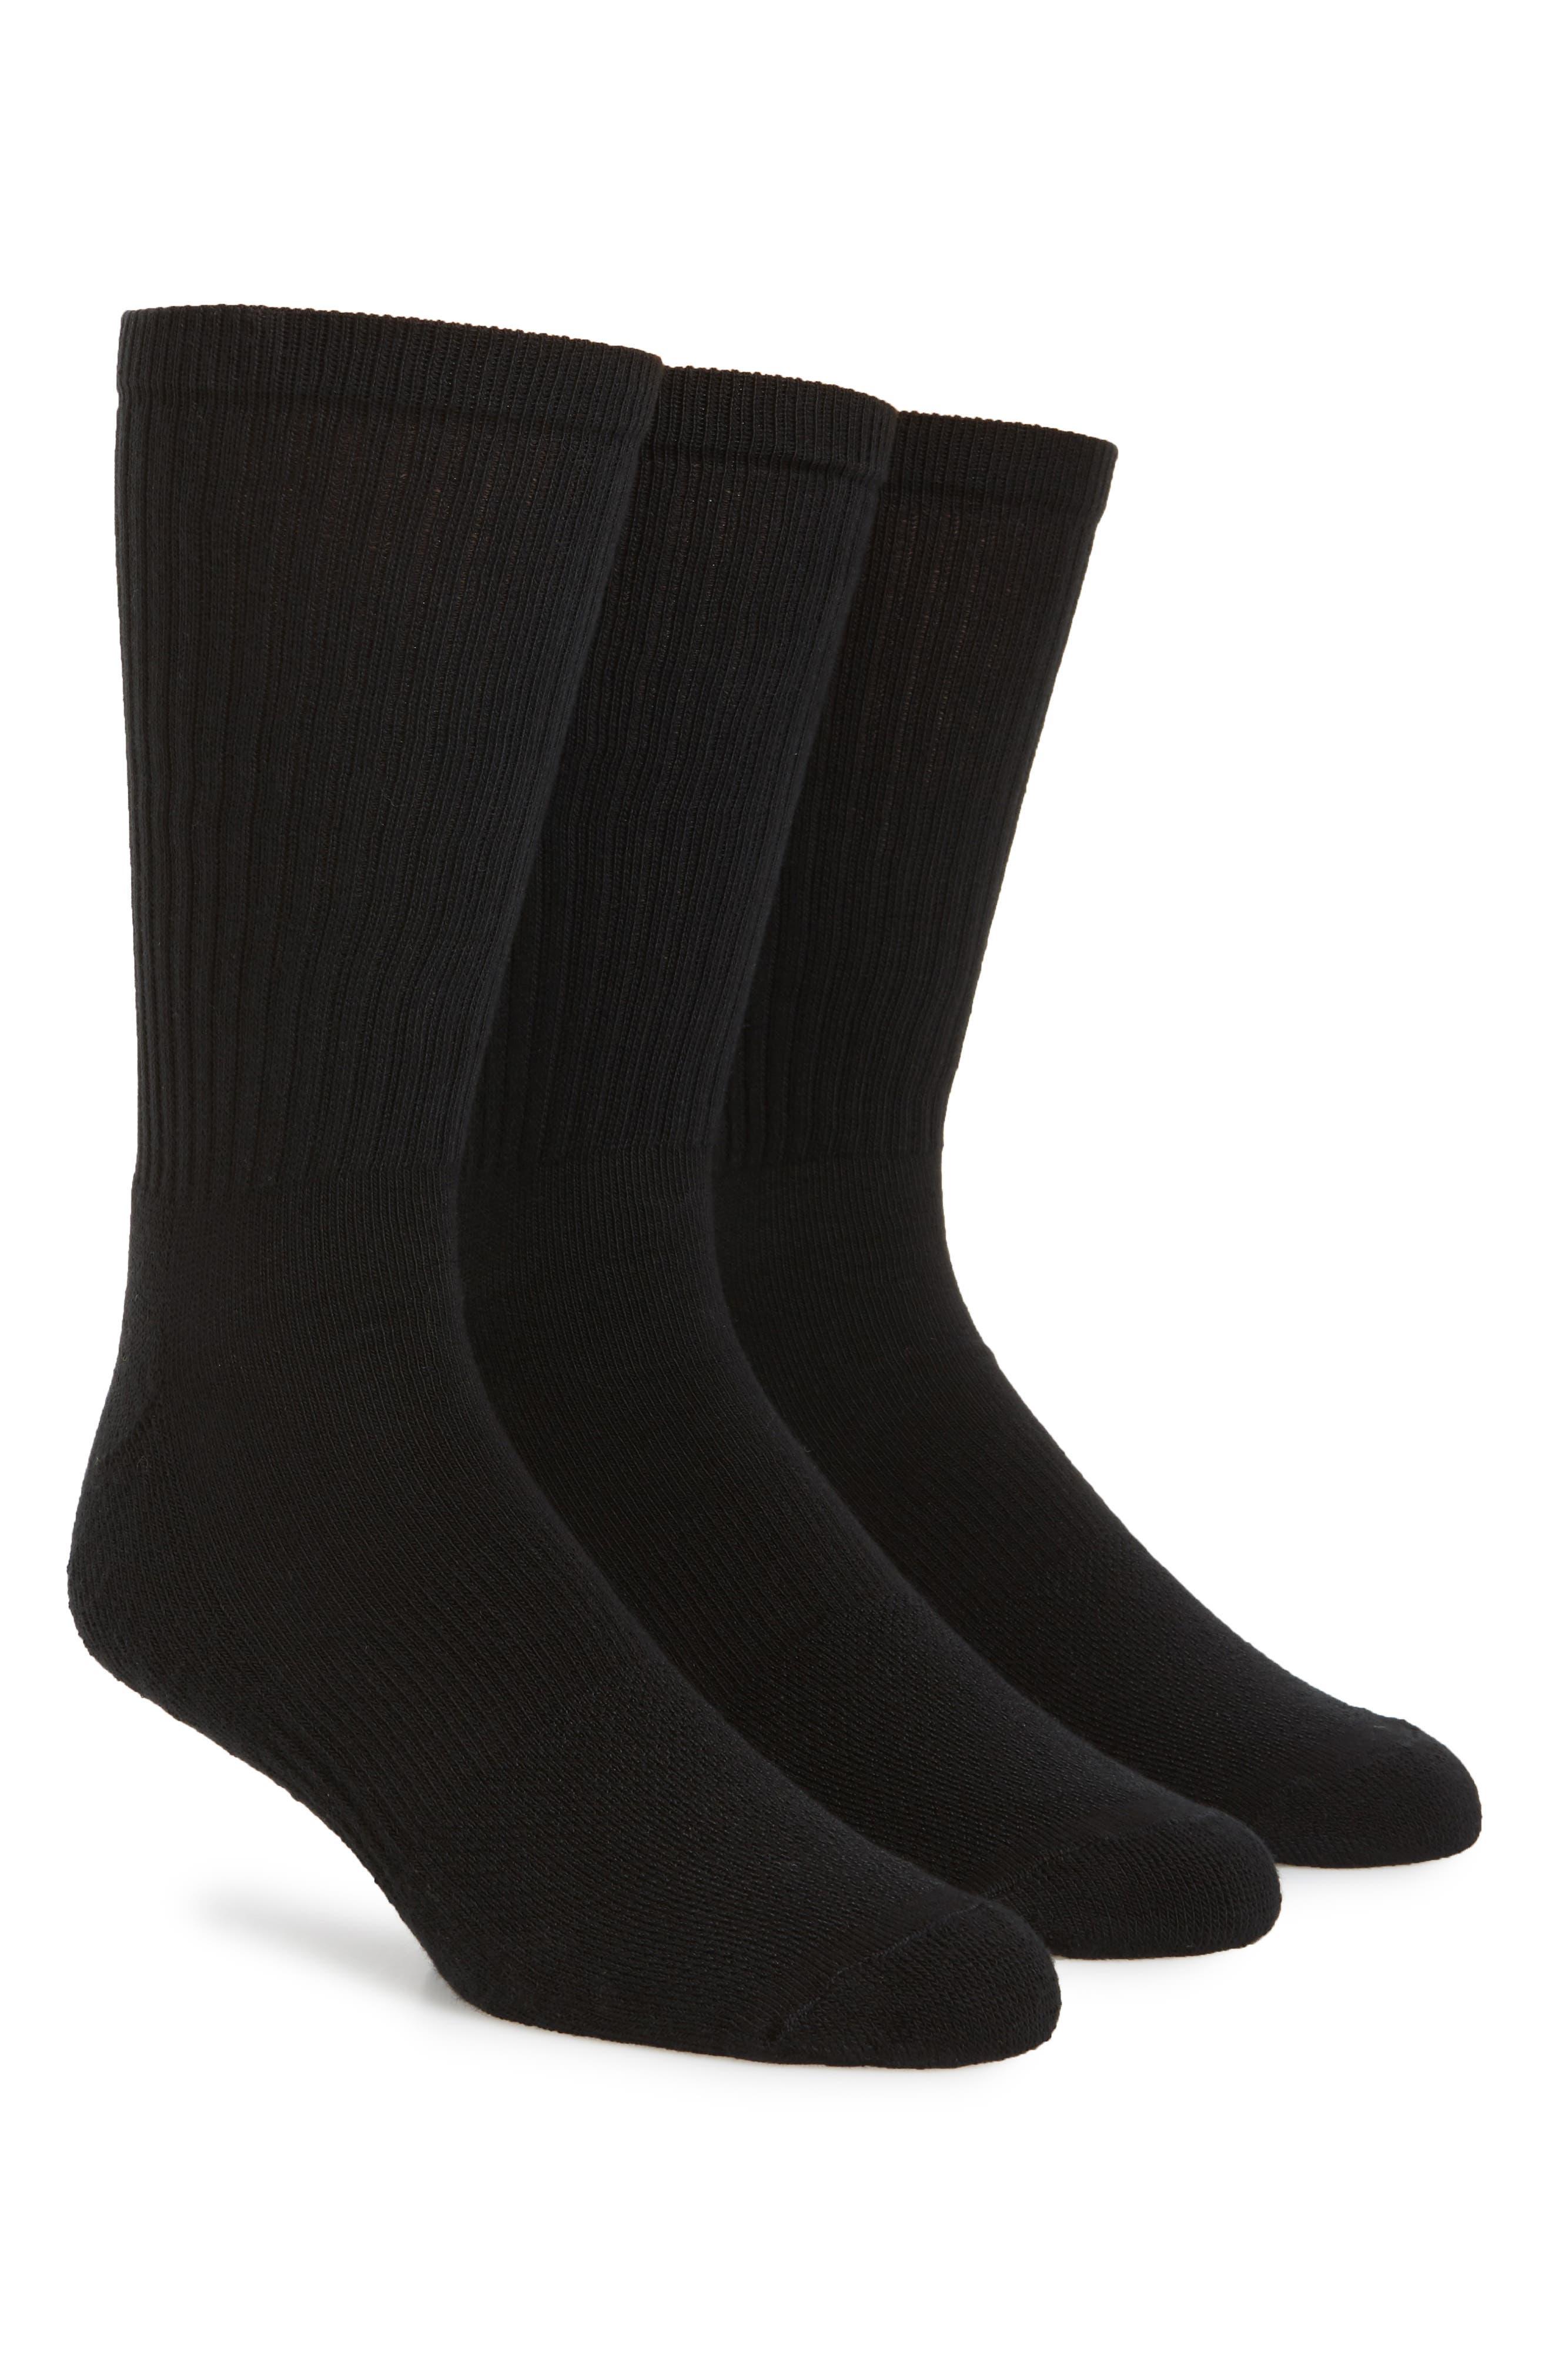 3-Pack Crew Cut Athletic Socks,                             Main thumbnail 1, color,                             Black